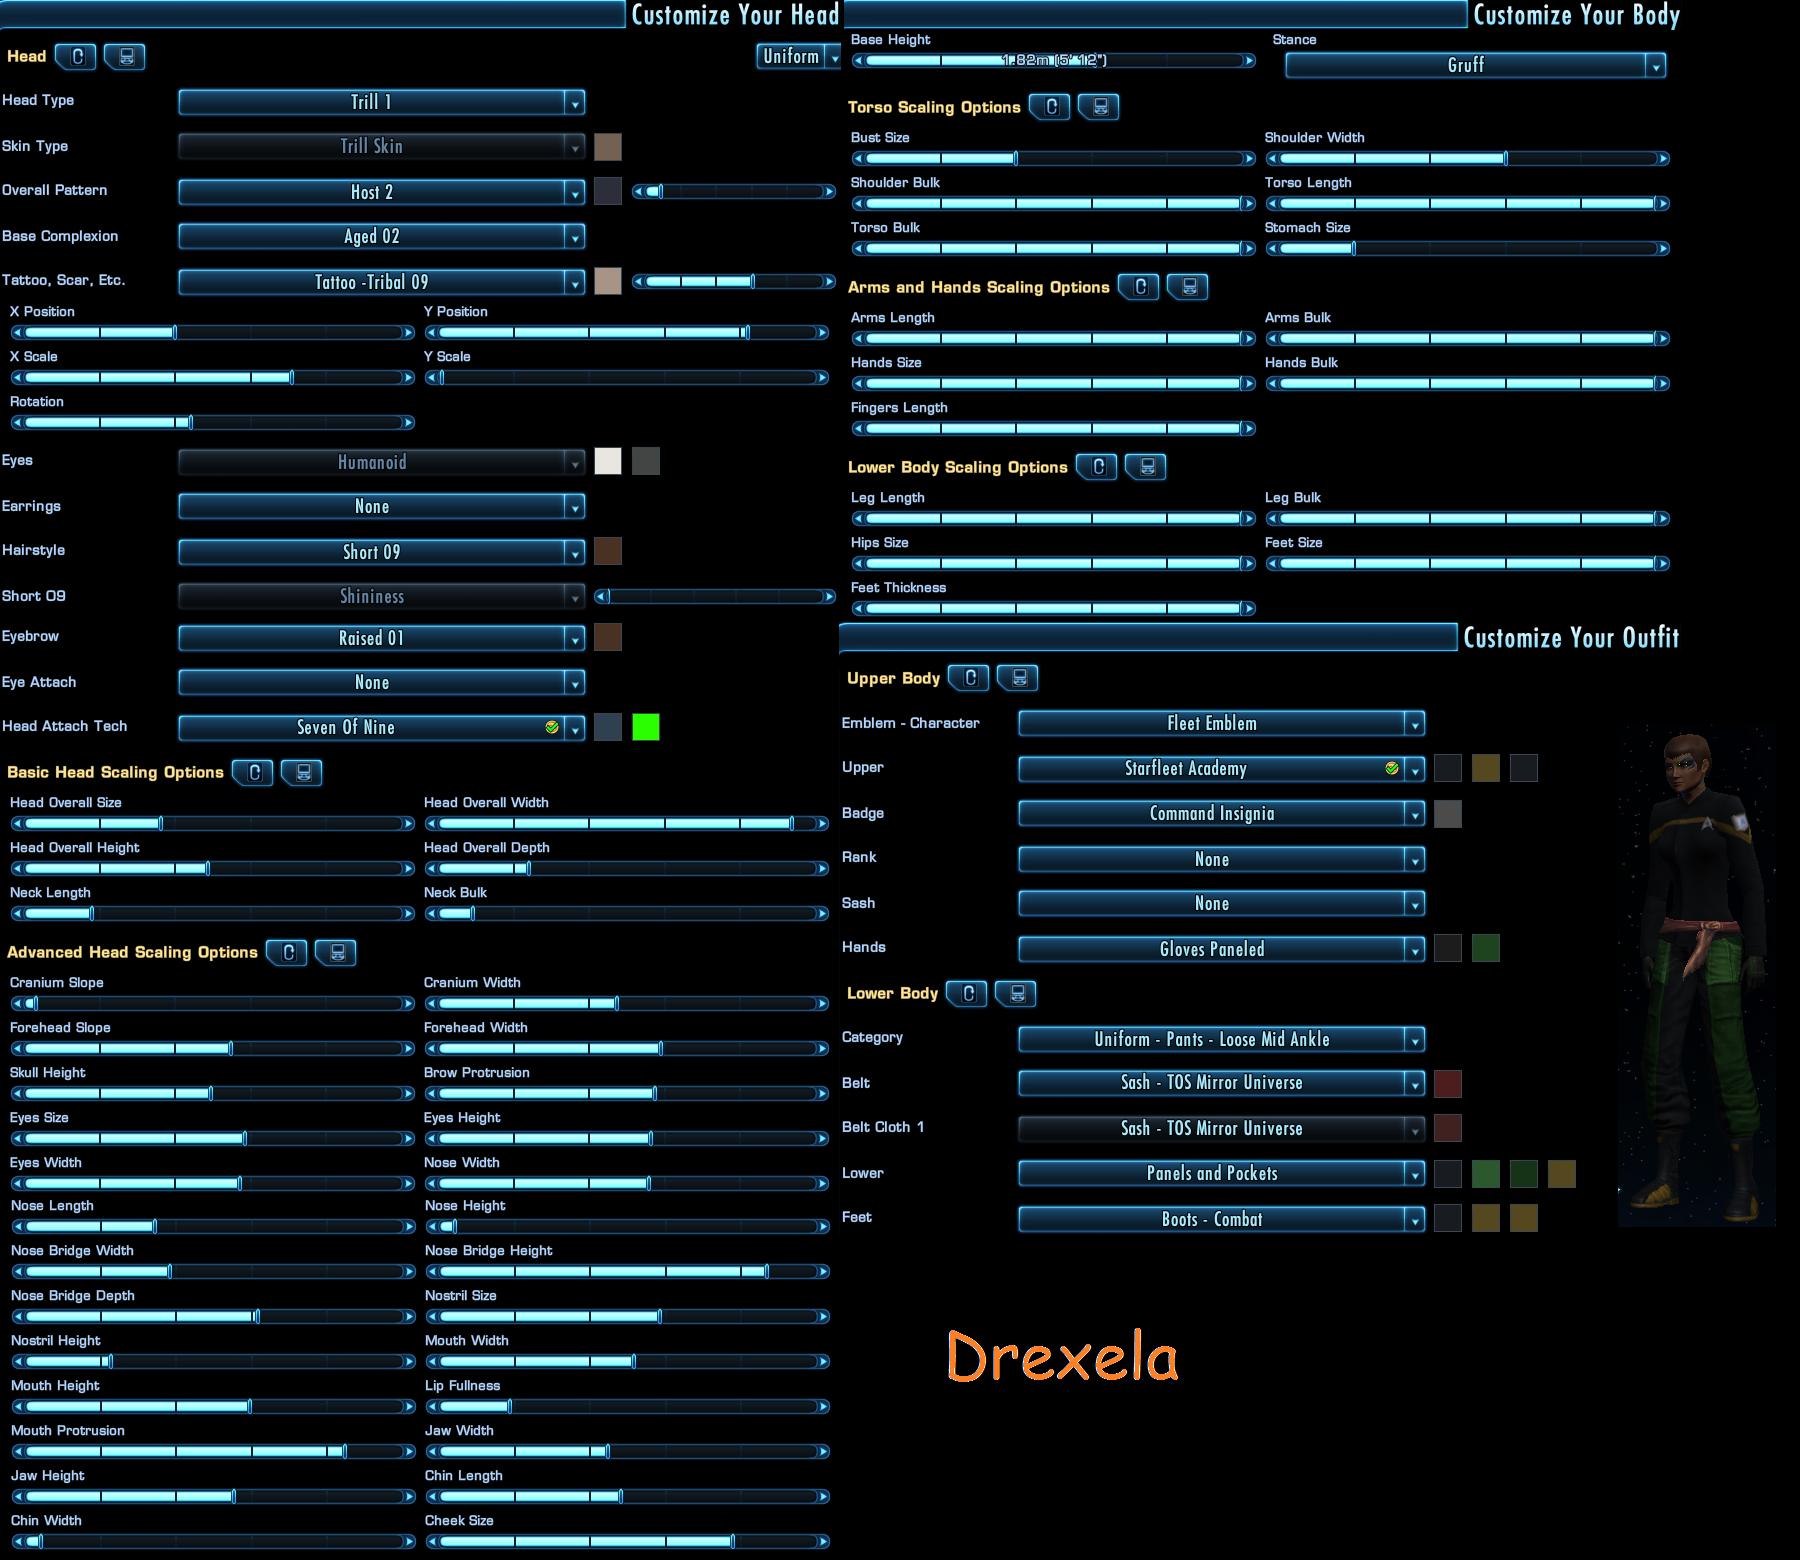 Drexela character sheet by marhawkman